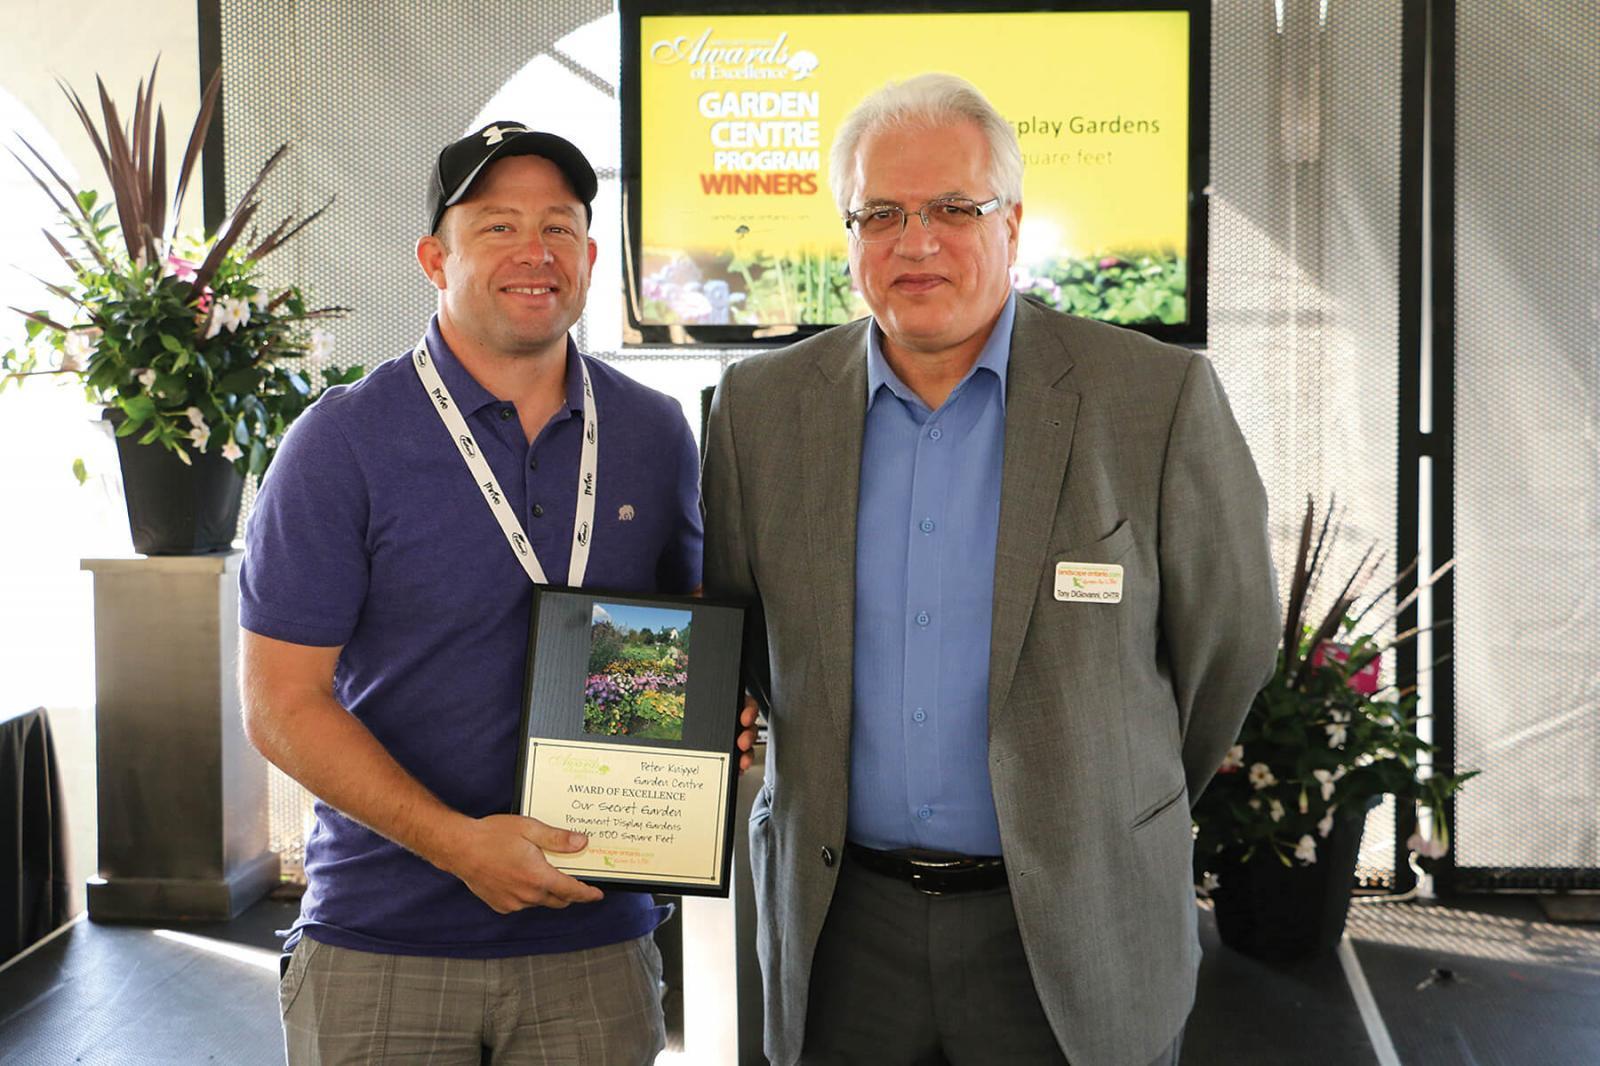 Garden centre awards program to open July 1